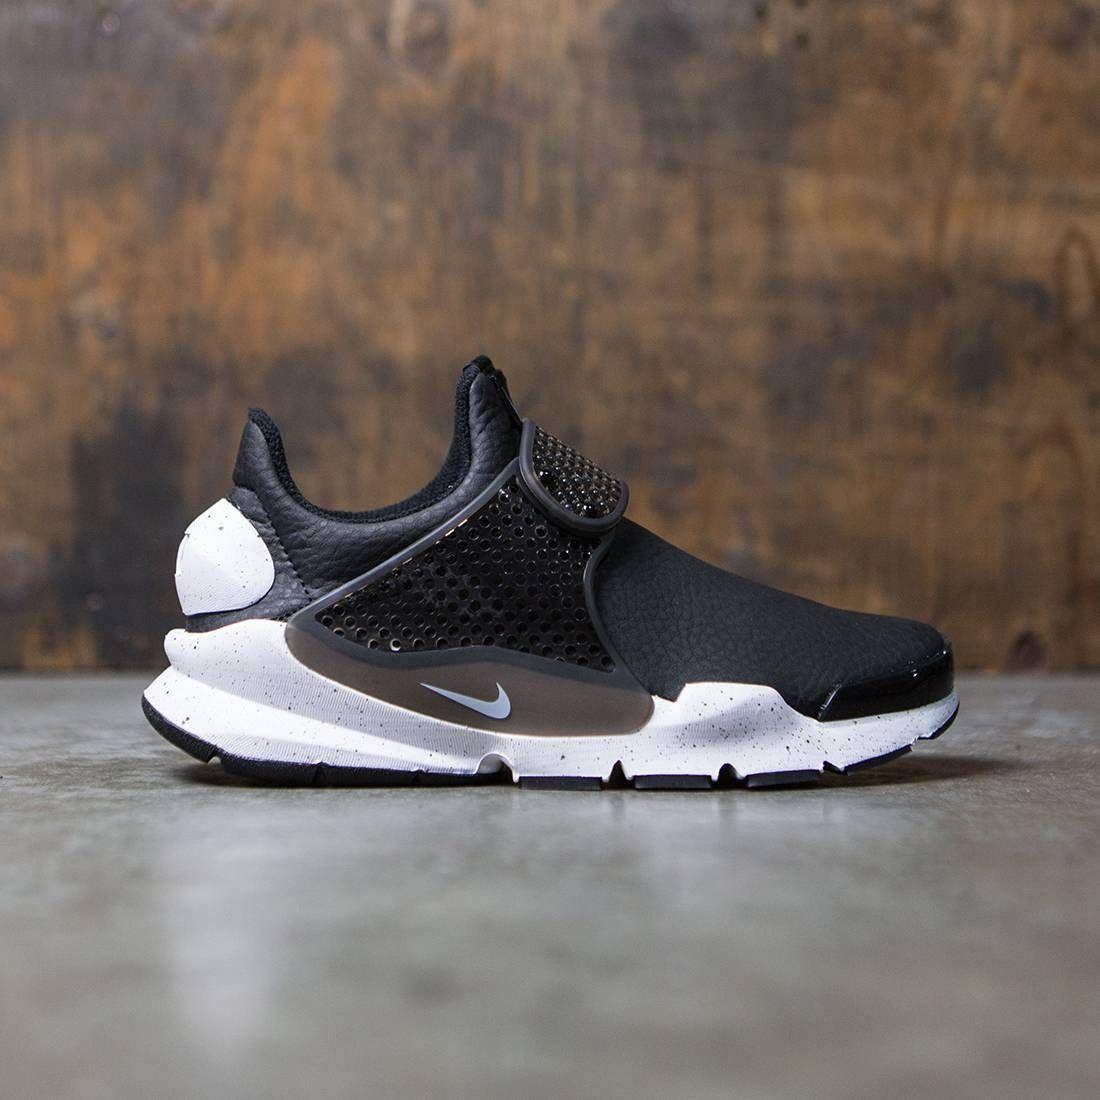 Nike Sock Dart 2020 Nike Women Wmns Nike Sock Dart Prm (black / white-black) in 2020 | Sneakers  men fashion, Nike sock dart, Nike air shoes